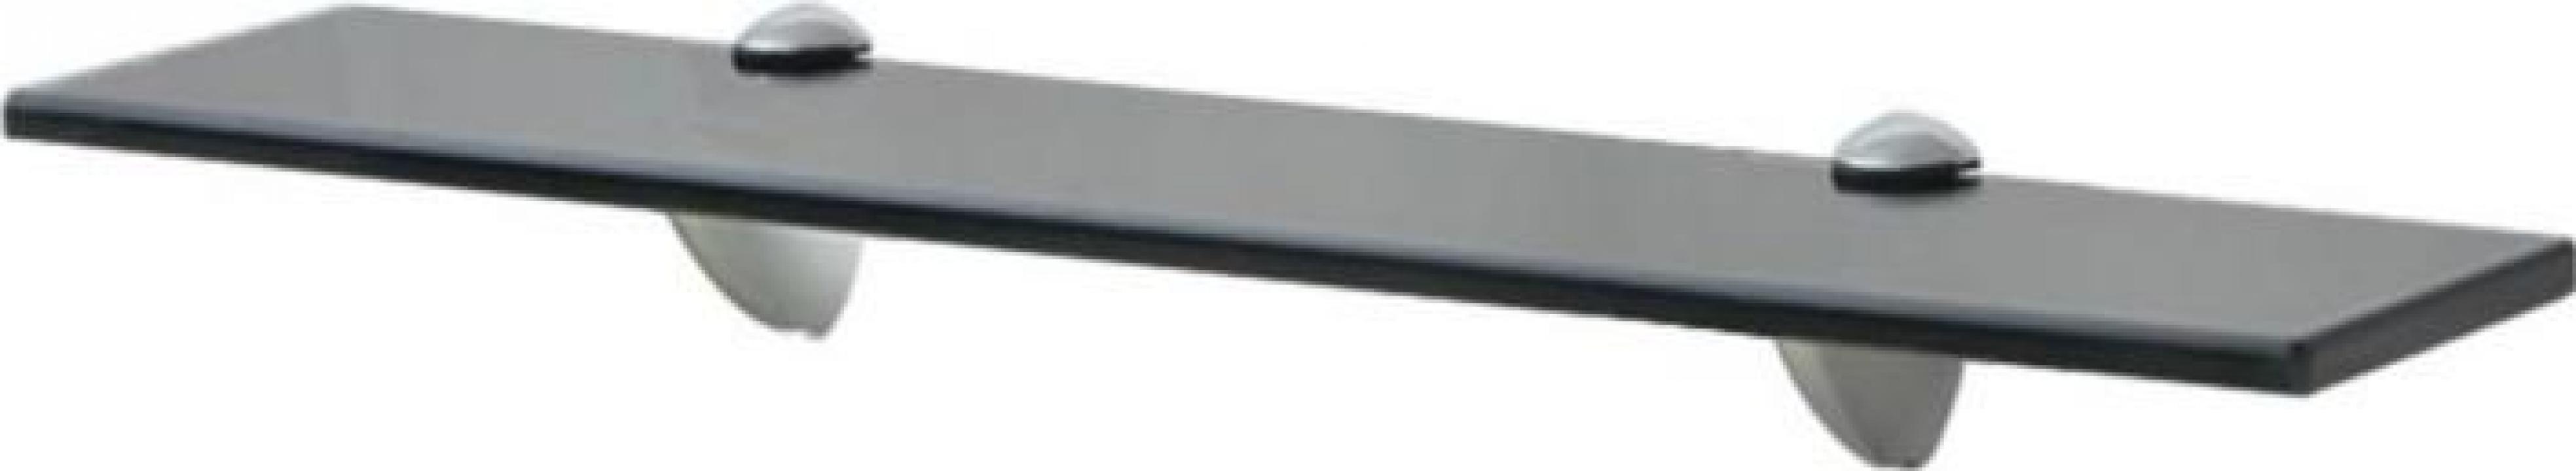 Raft suspendat din sticla, 50 x 20 cm, 8 mm